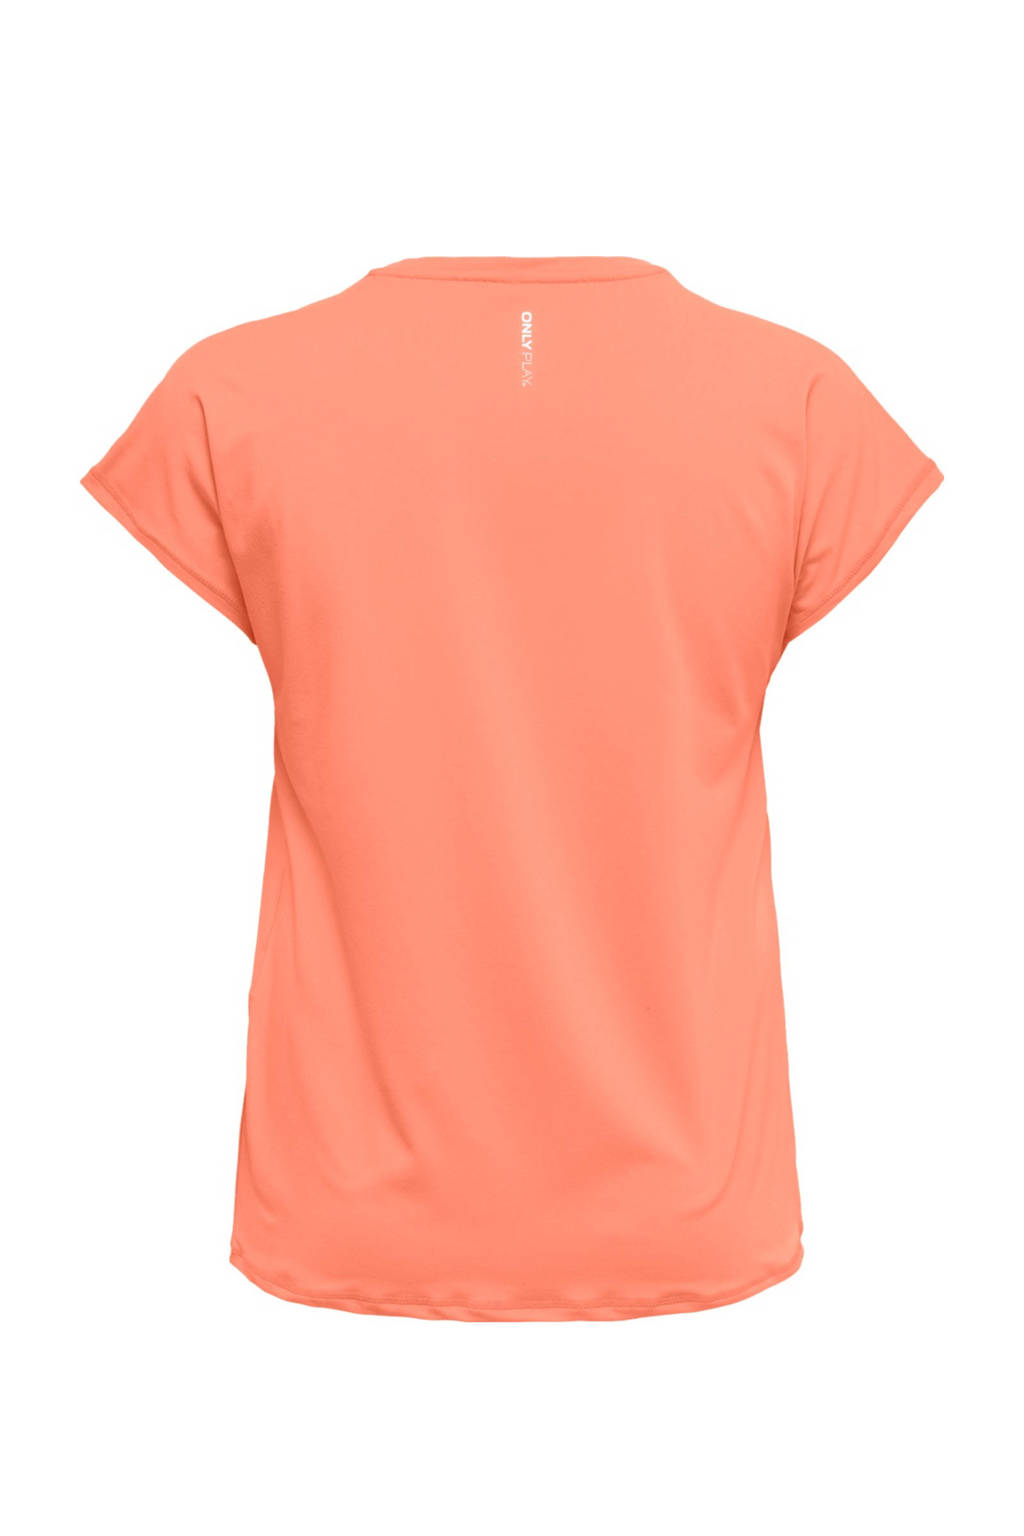 ONLY PLAY sport T-shirt oranje, Oranje